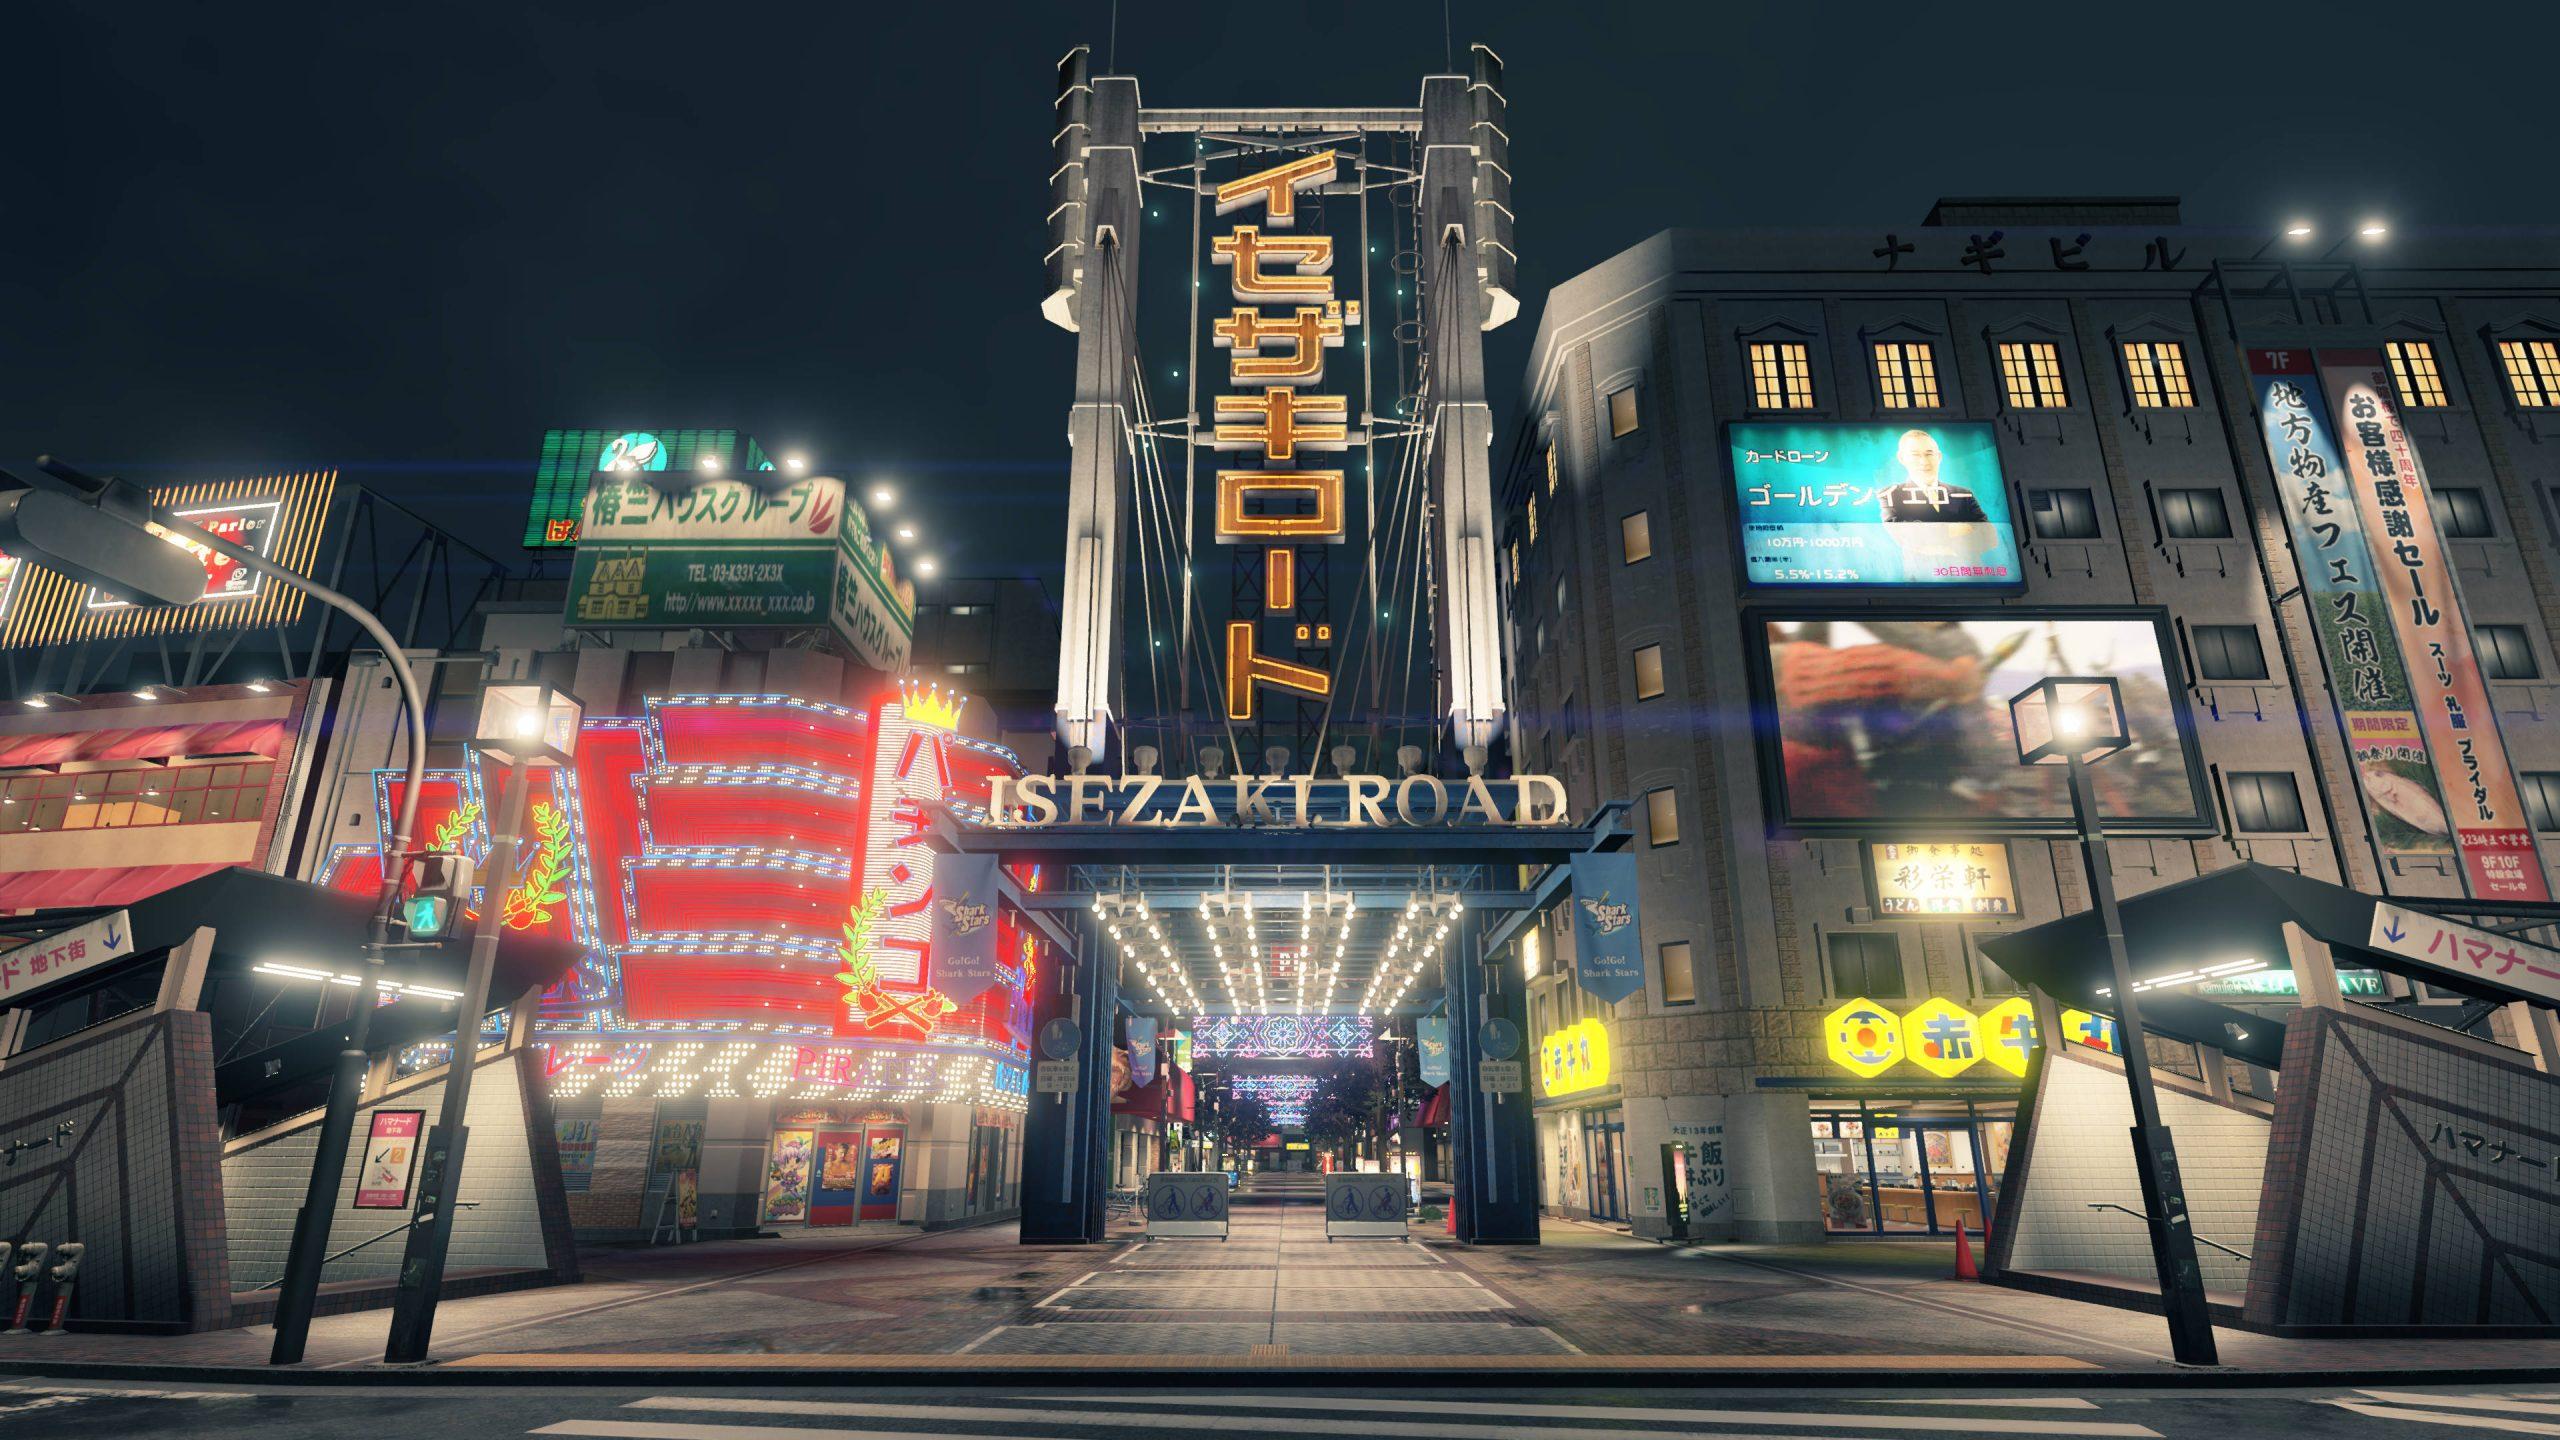 Yakuza: Like a Dragon screenshot: Looking at the bright lights on Isezaki Road in Ijincho.